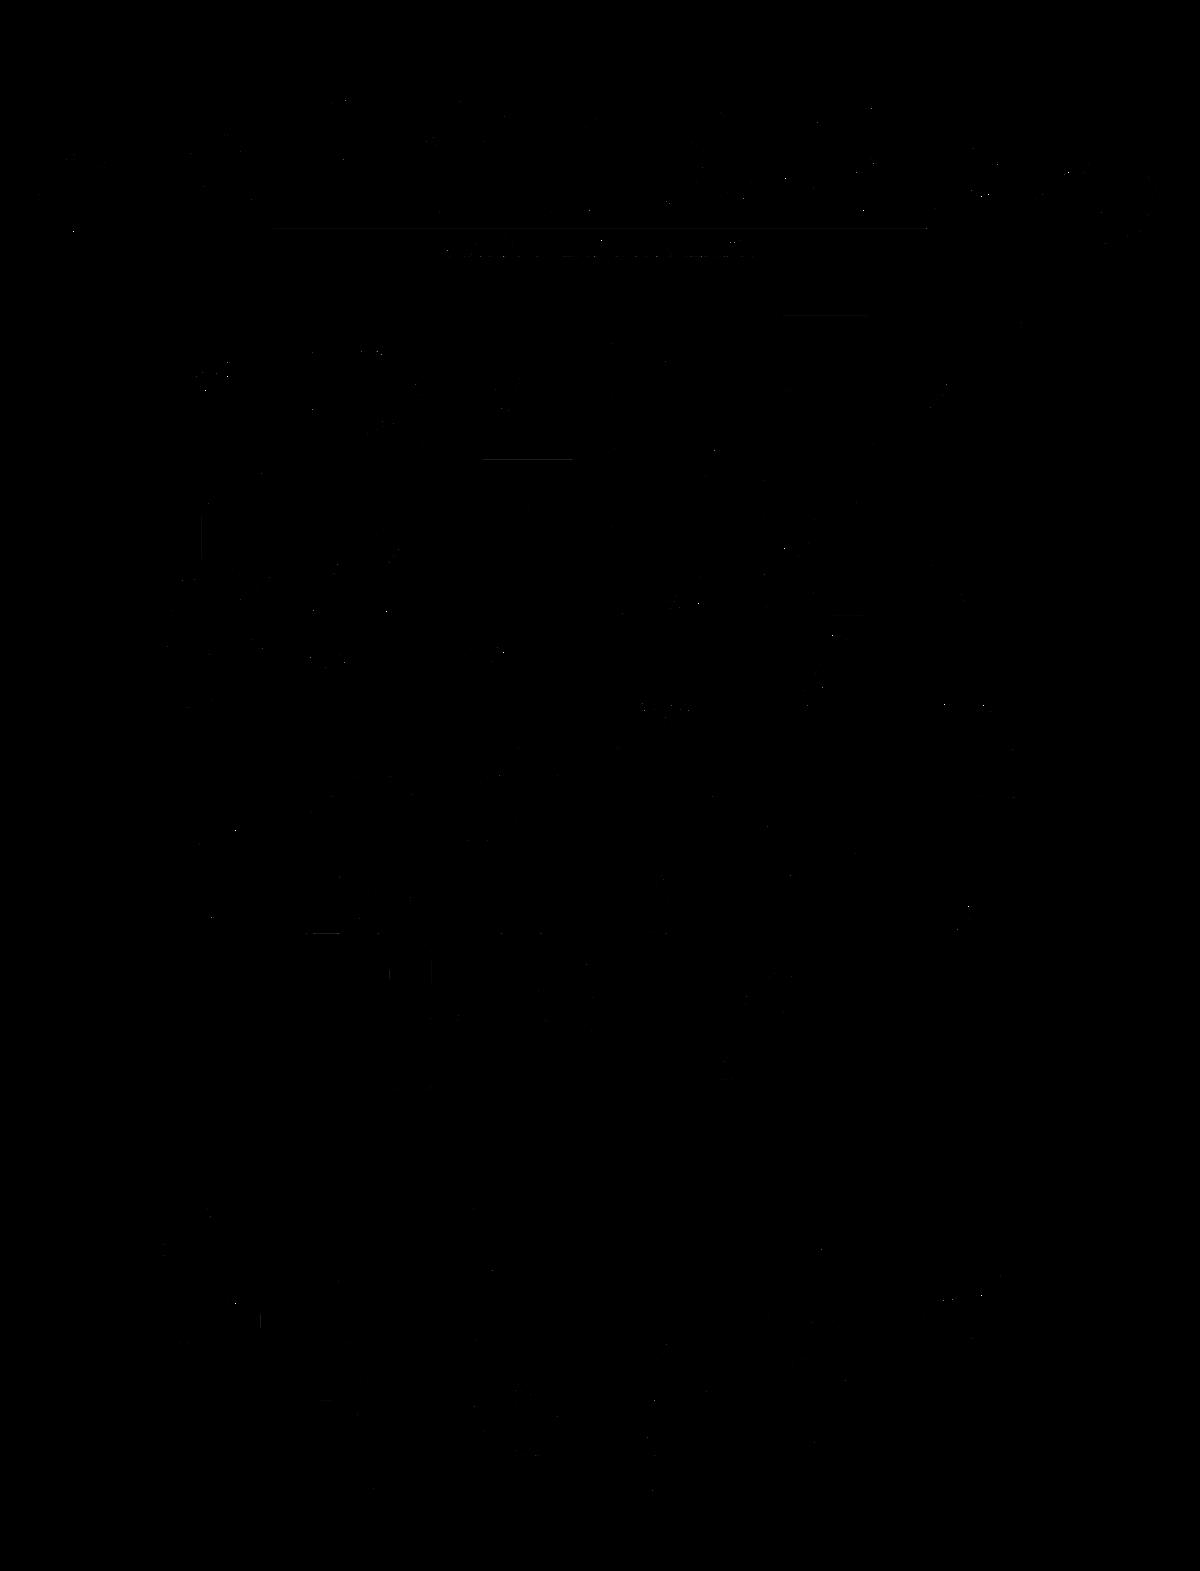 4496 Ejemplo de elementos quimicos furthermore Pedagogia Libros Pdf Gratis further Langosta Voladora additionally Pintura Rupestre likewise 40308 Vw Mexico 50 Anos De Historia. on historia de mexico